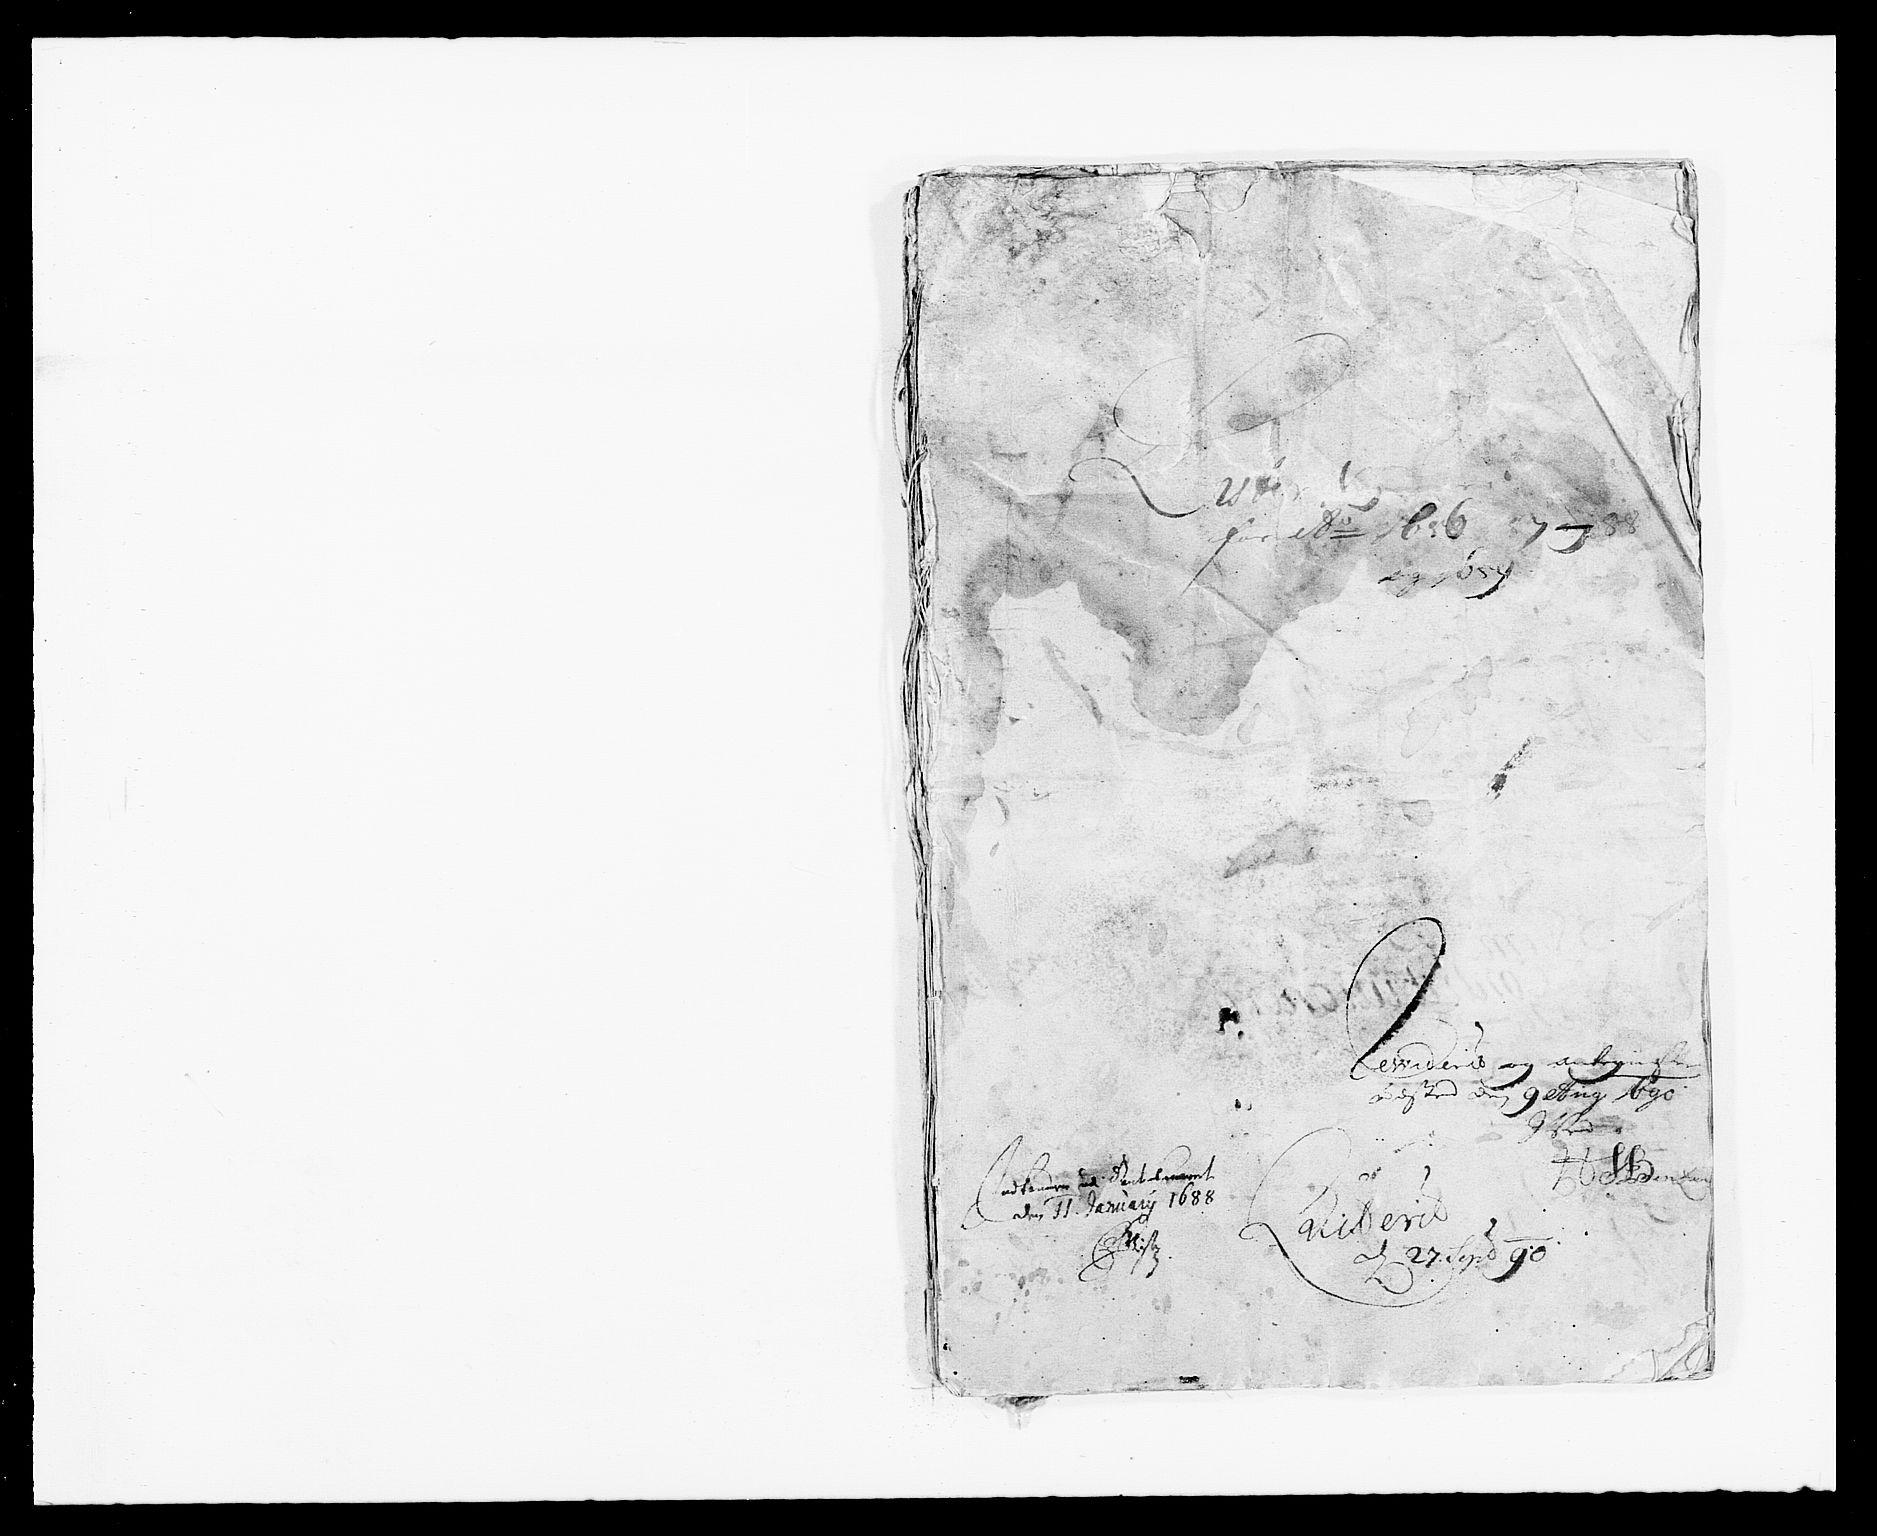 RA, Rentekammeret inntil 1814, Reviderte regnskaper, Fogderegnskap, R41/L2534: Fogderegnskap Lista, 1686-1688, s. 1